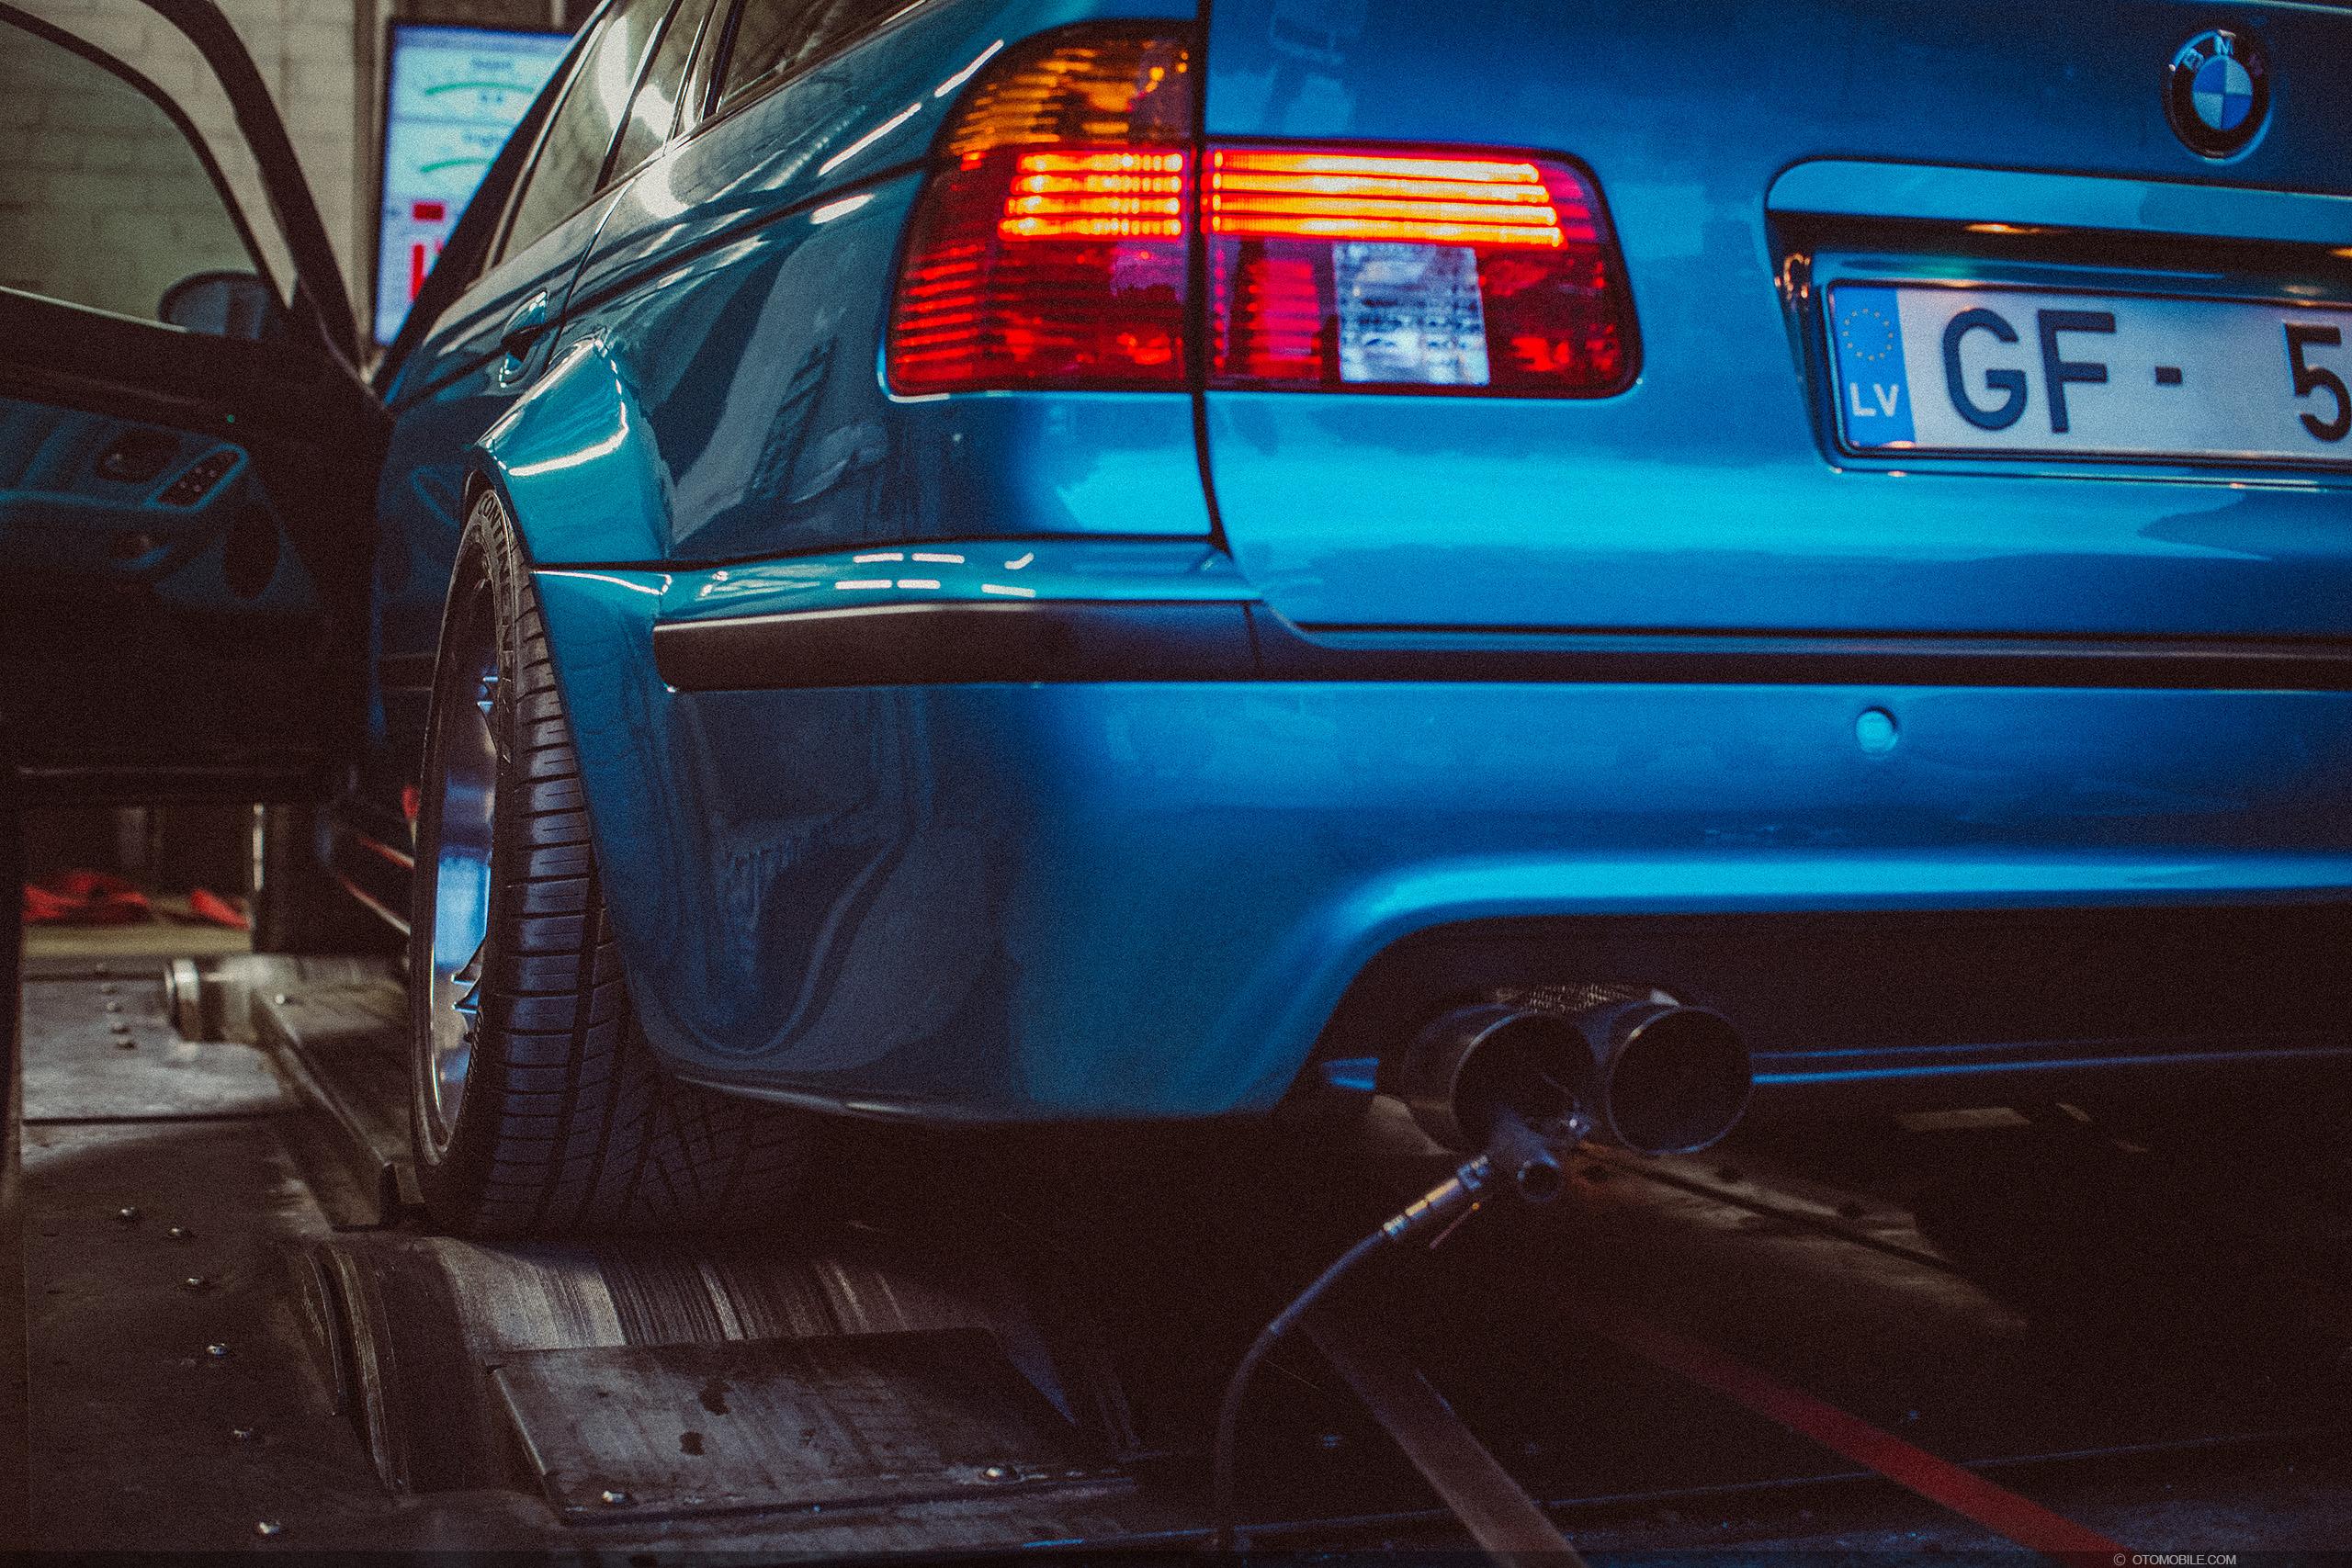 "BMW M5 E39 Touring Wide-Body ESS Supercharged ""BMW Individual Program"" 1 of 7 Atlantis Metallic with 1 of 1 Titanic Blau interior. Dyno tune at Dyno Systems, Riga, Latvia on a Superflow Dyno."